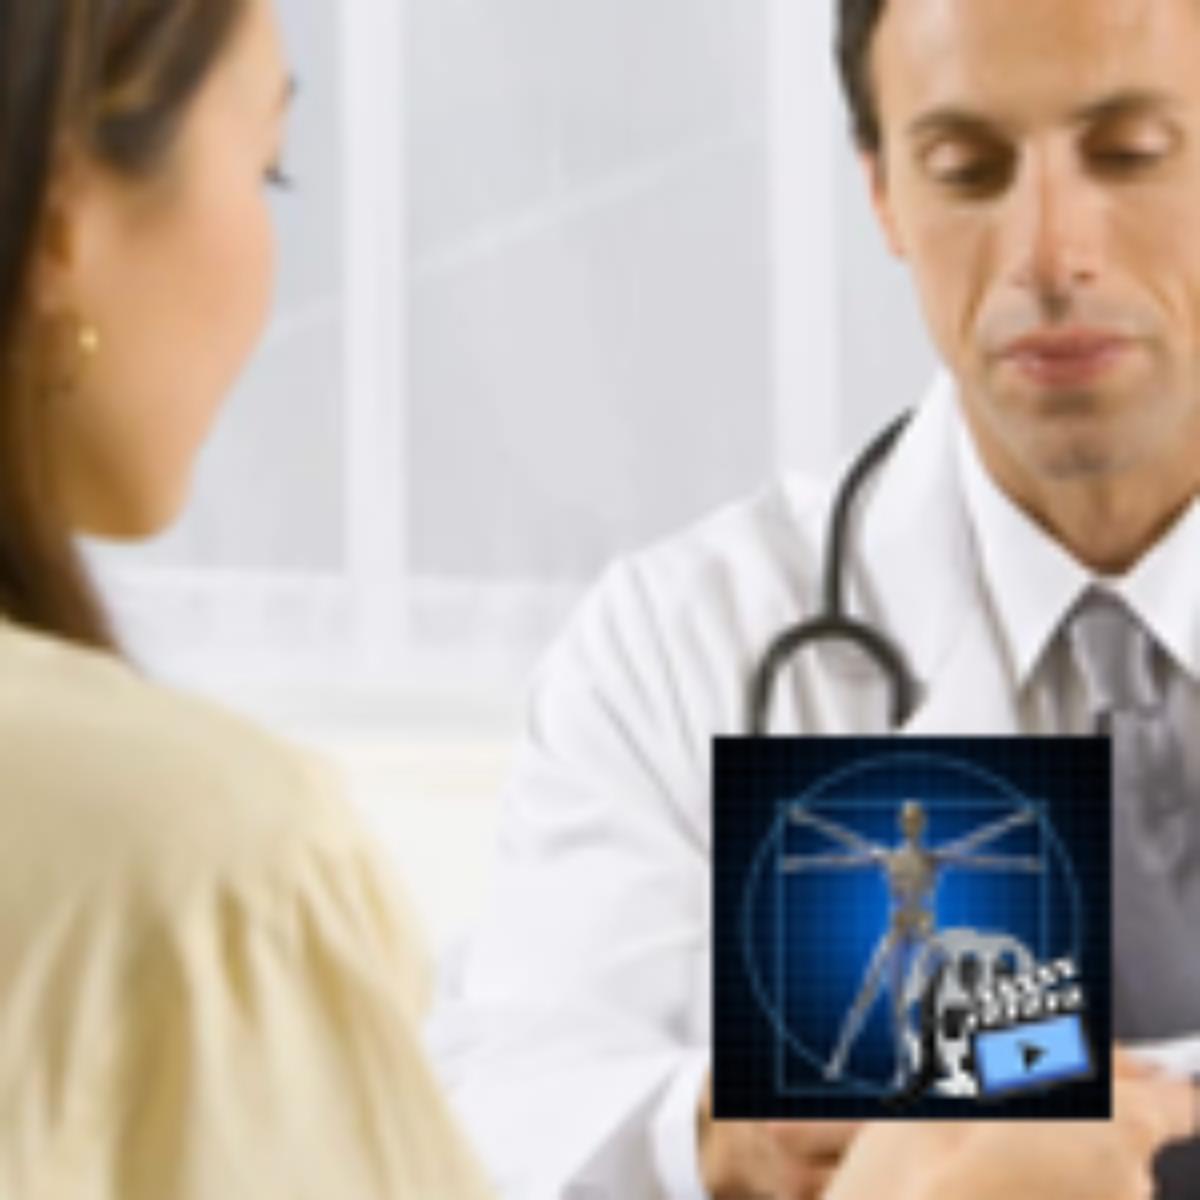 Sciatica: Surgery or Chiropractic?